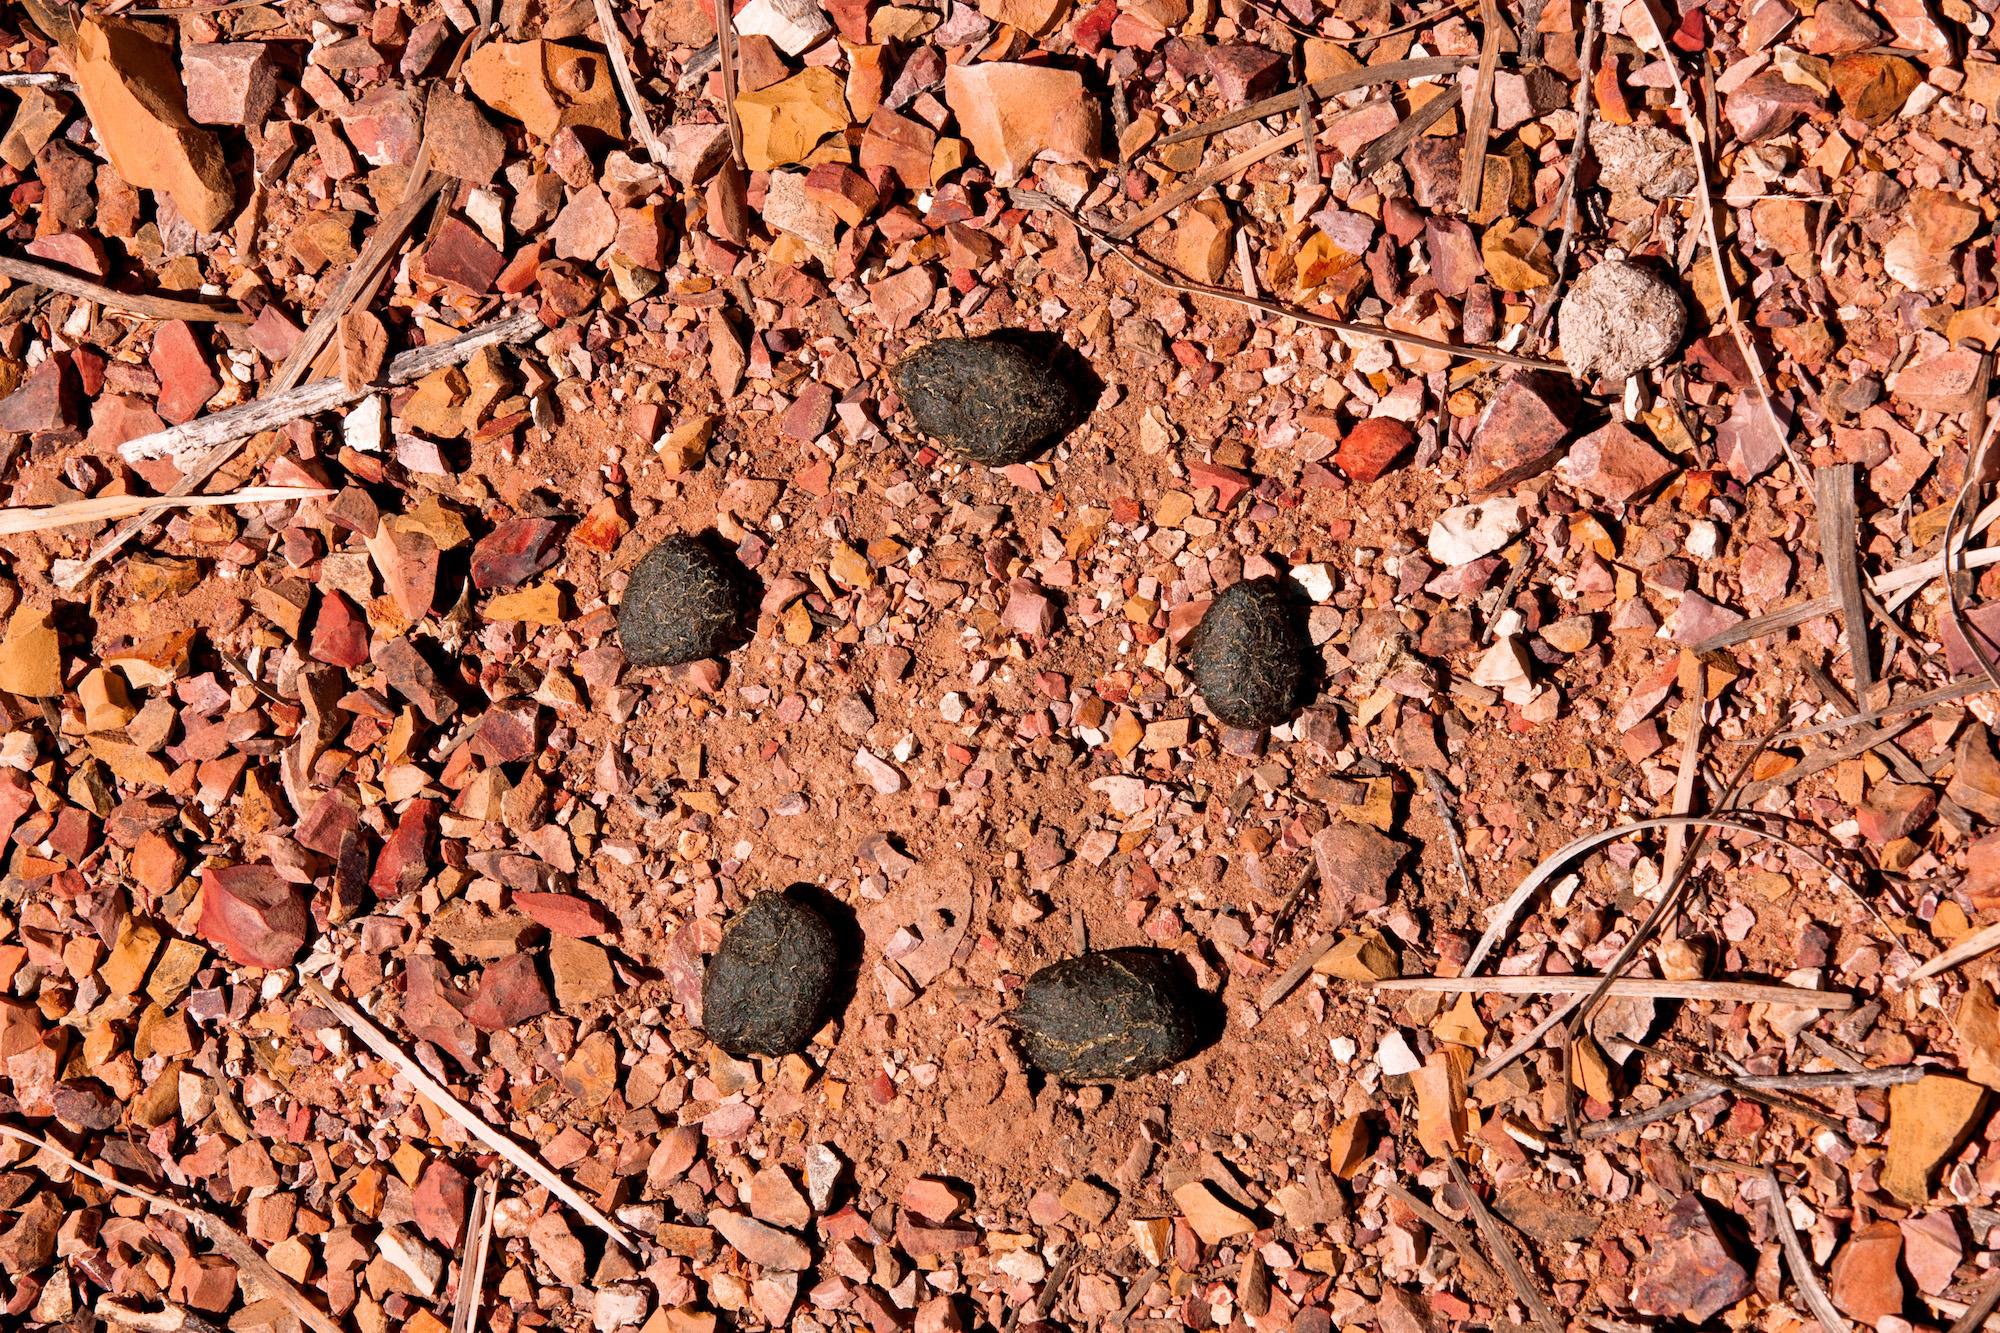 Kangaroo Droppings, Winton, Queensland, Australia, 2013